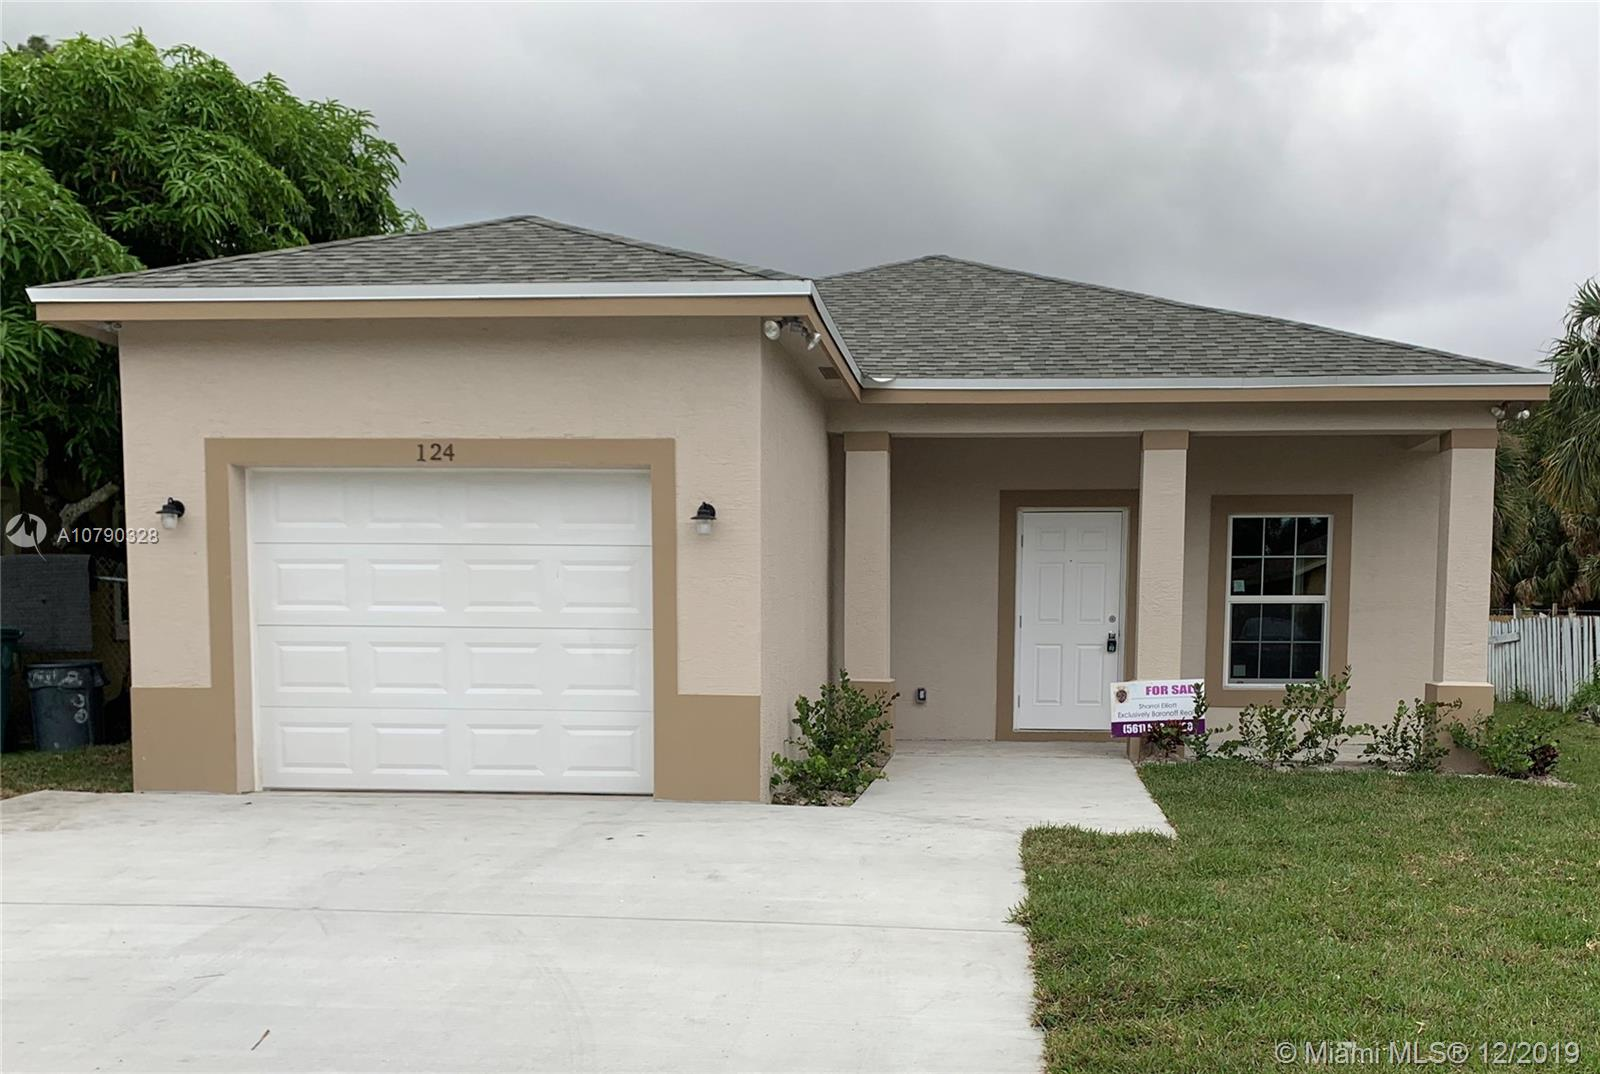 124 NE 11 Ave, Boynton Beach, FL 33435 - Boynton Beach, FL real estate listing